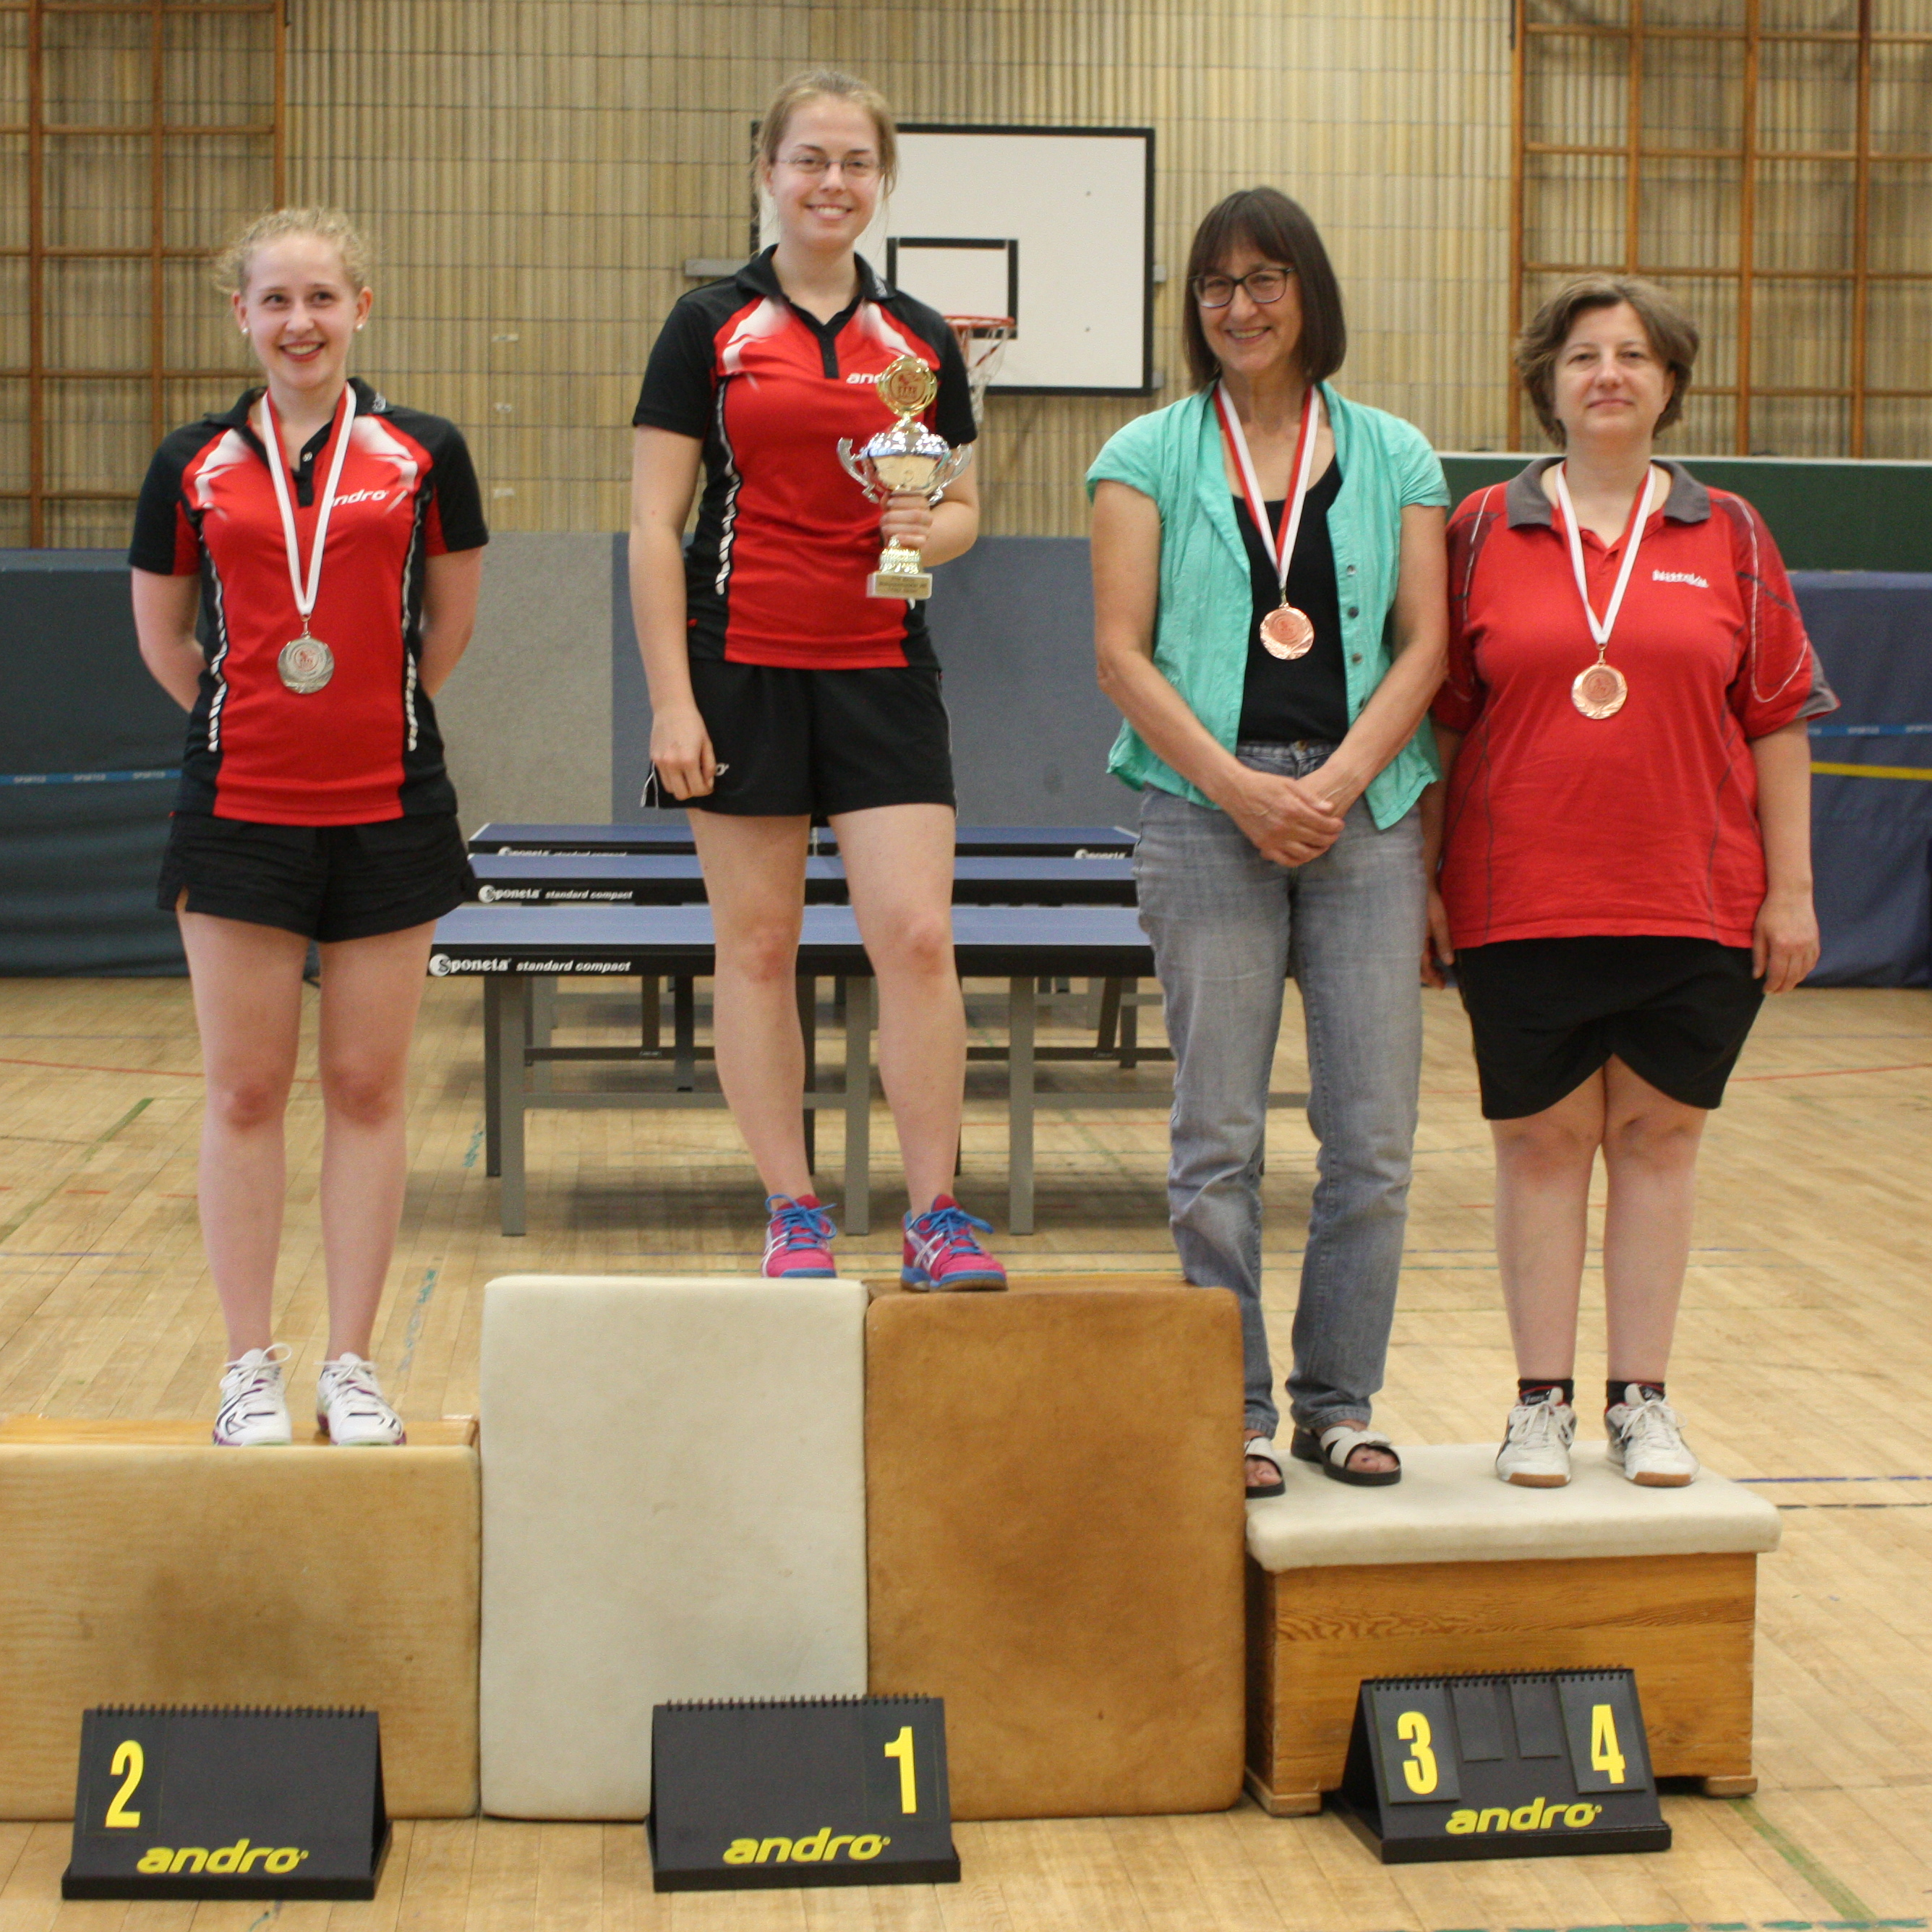 Siegerehrung Damen Einzel:1. Platz: Svenja, 2. Platz: Sophie, 3. Platz: Johanna, 4. Platz: Petra